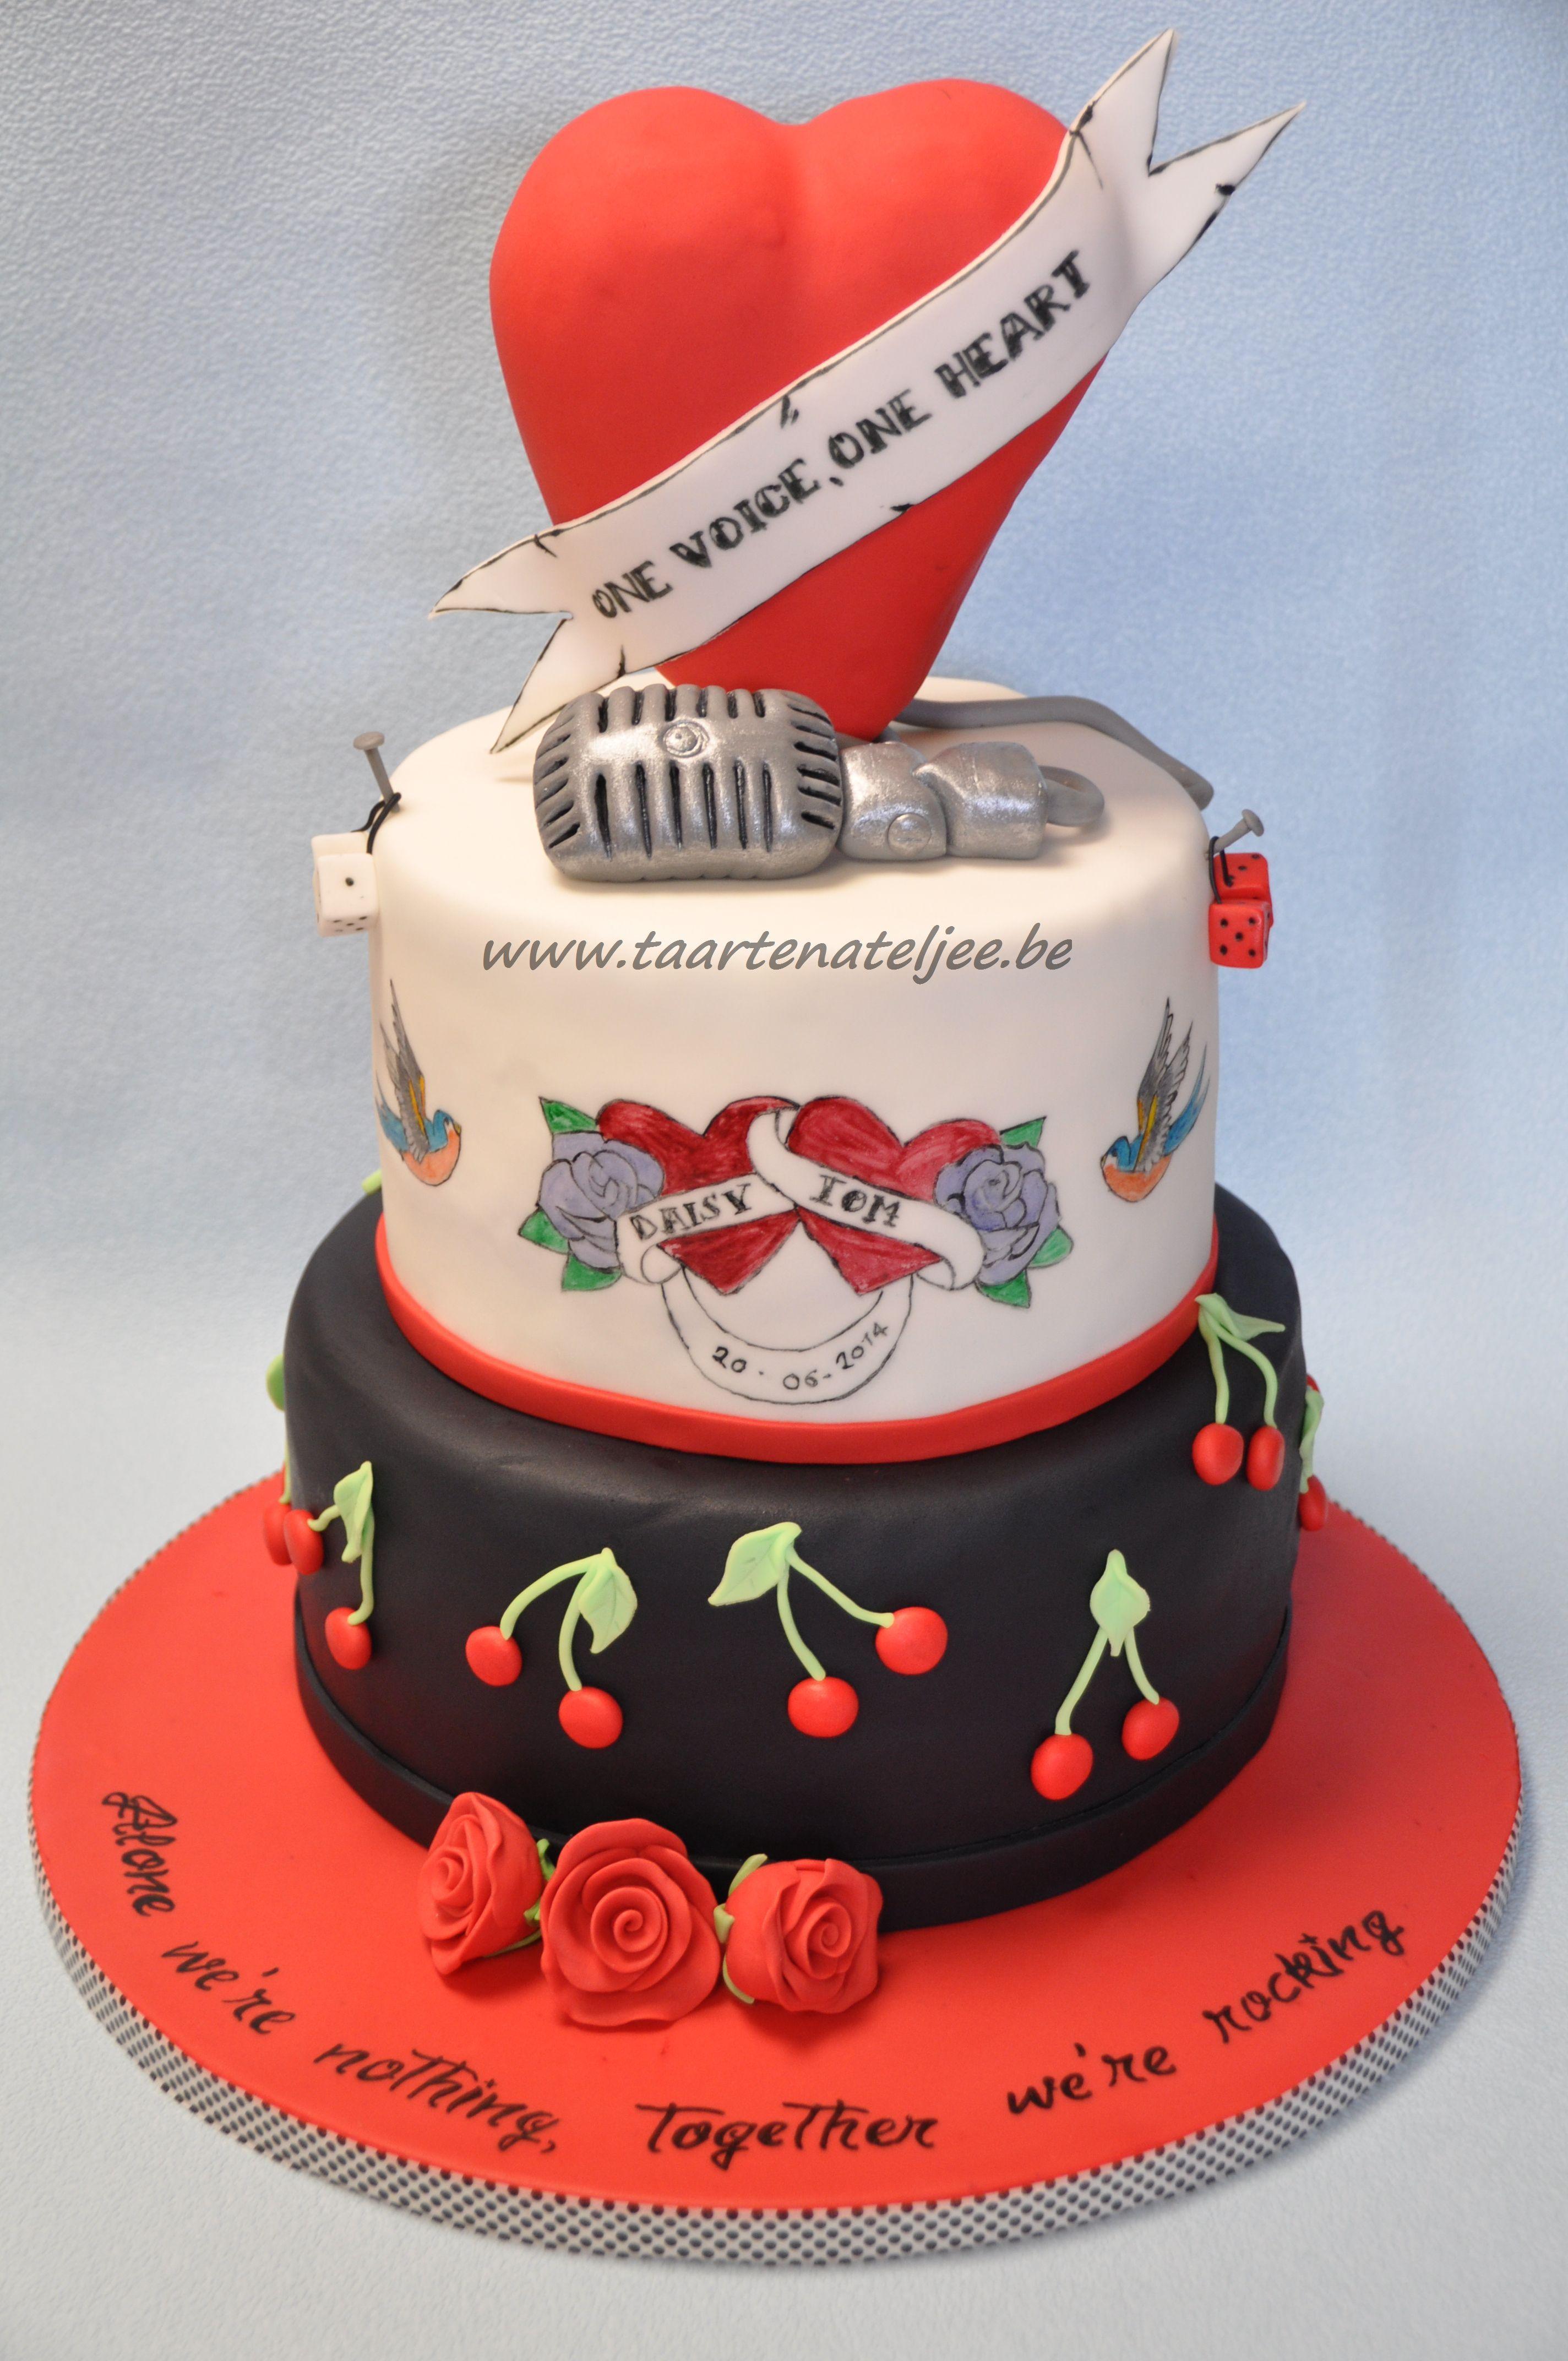 Rockabilly Cake Pinup Jeans Pinterest Rockabilly Cake - Rockabilly birthday cake